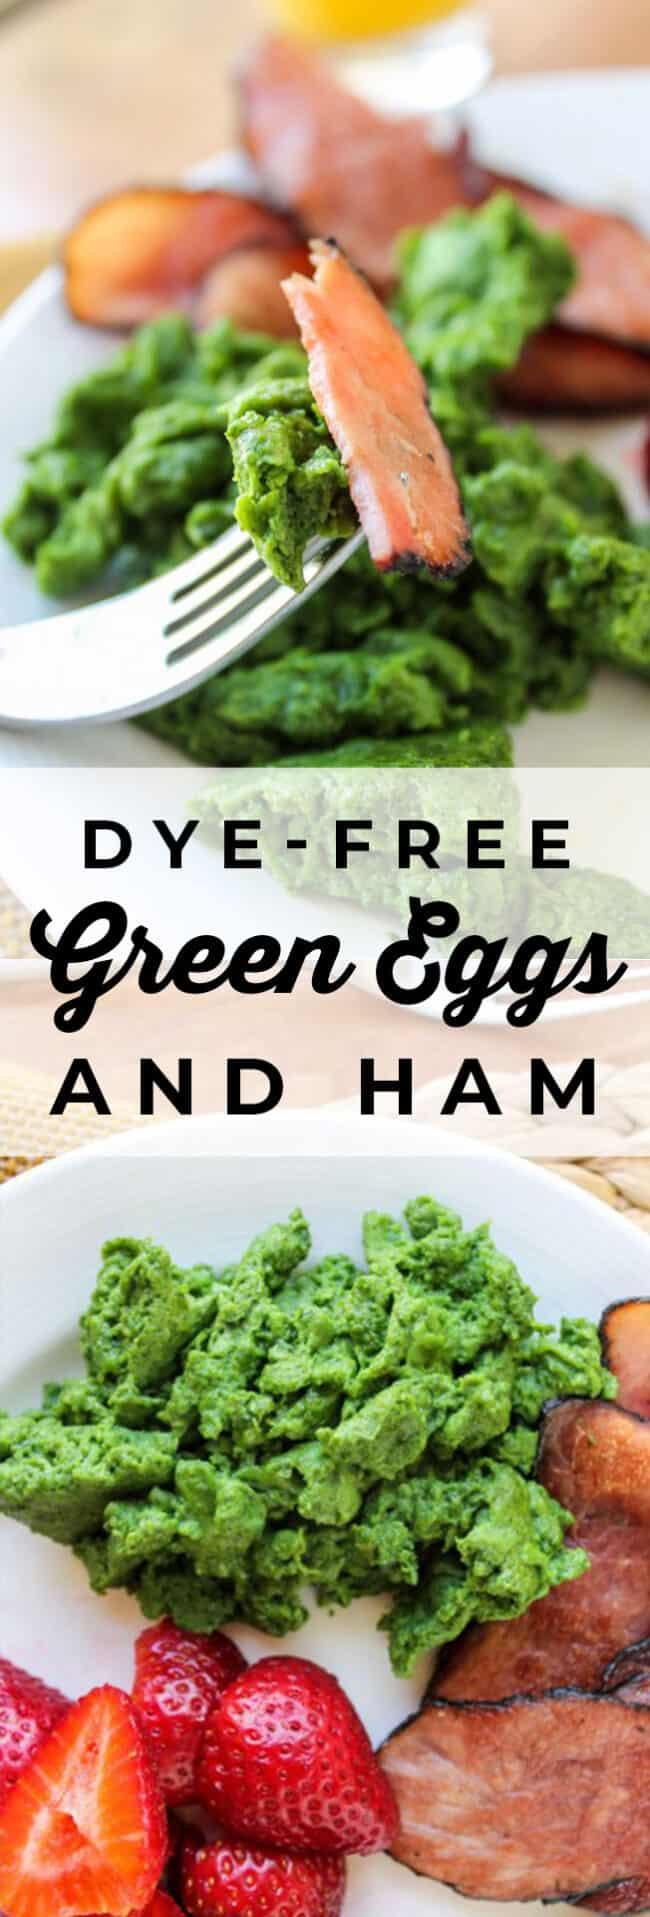 Dye-Free Green Eggs and Ham - The Food Charlatan